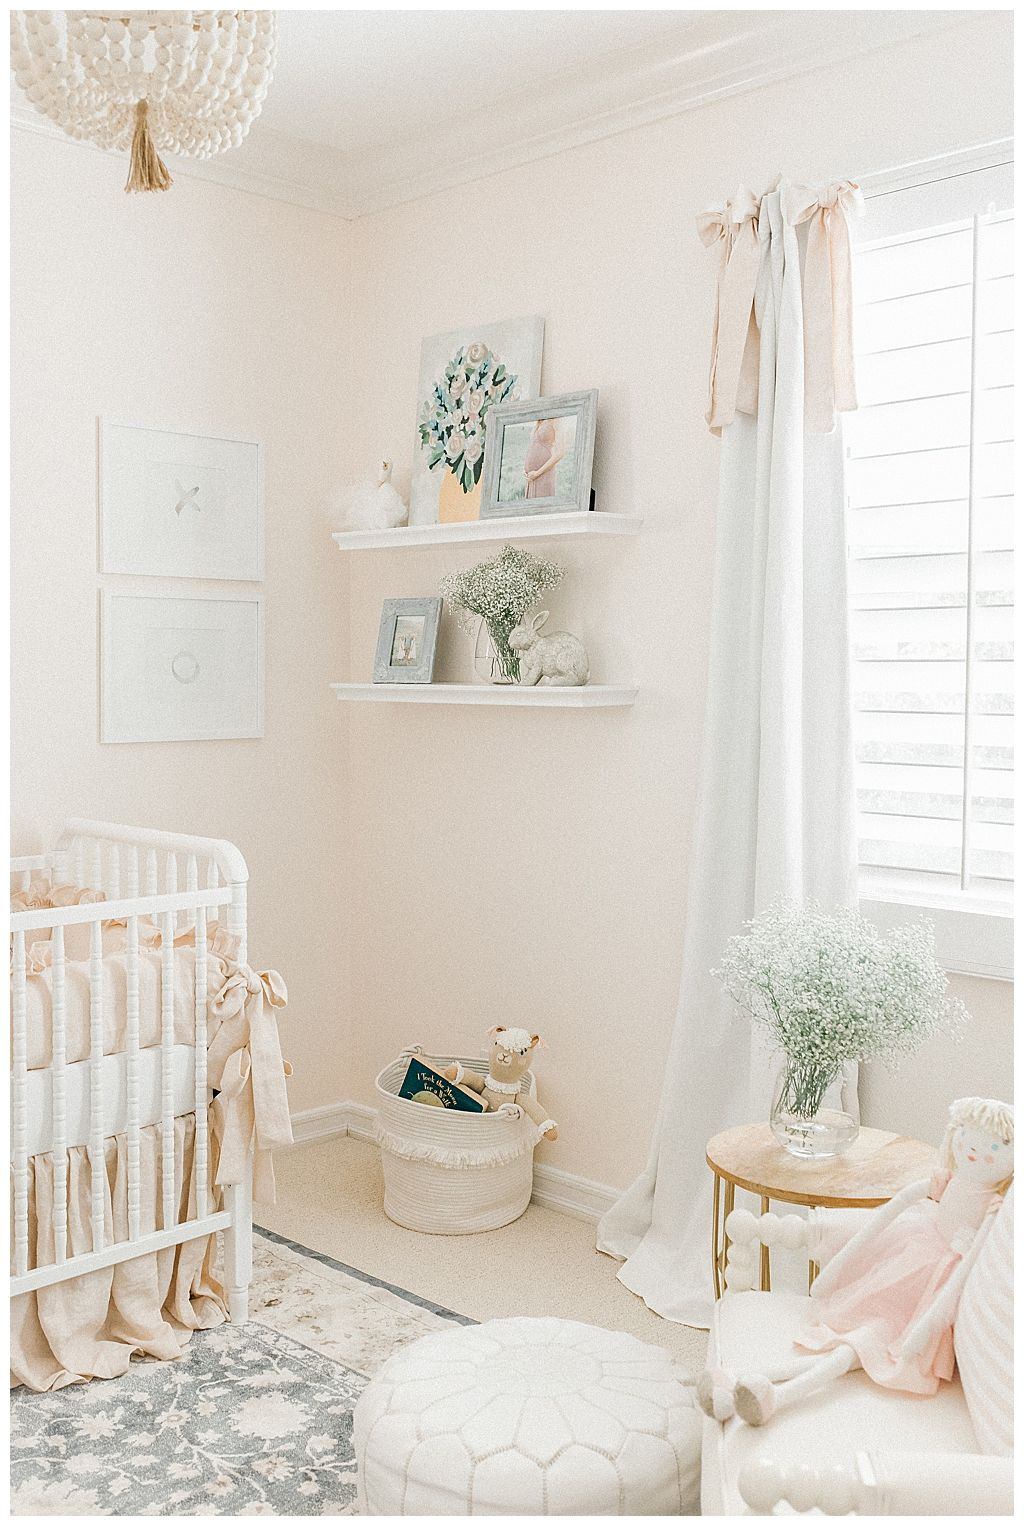 Pretty Smitten Nursery  Baby Girl Nursery Inspiration  Pretty Smitten Blog  Elizabeth Johnson Photography is part of Nursery inspiration girl -